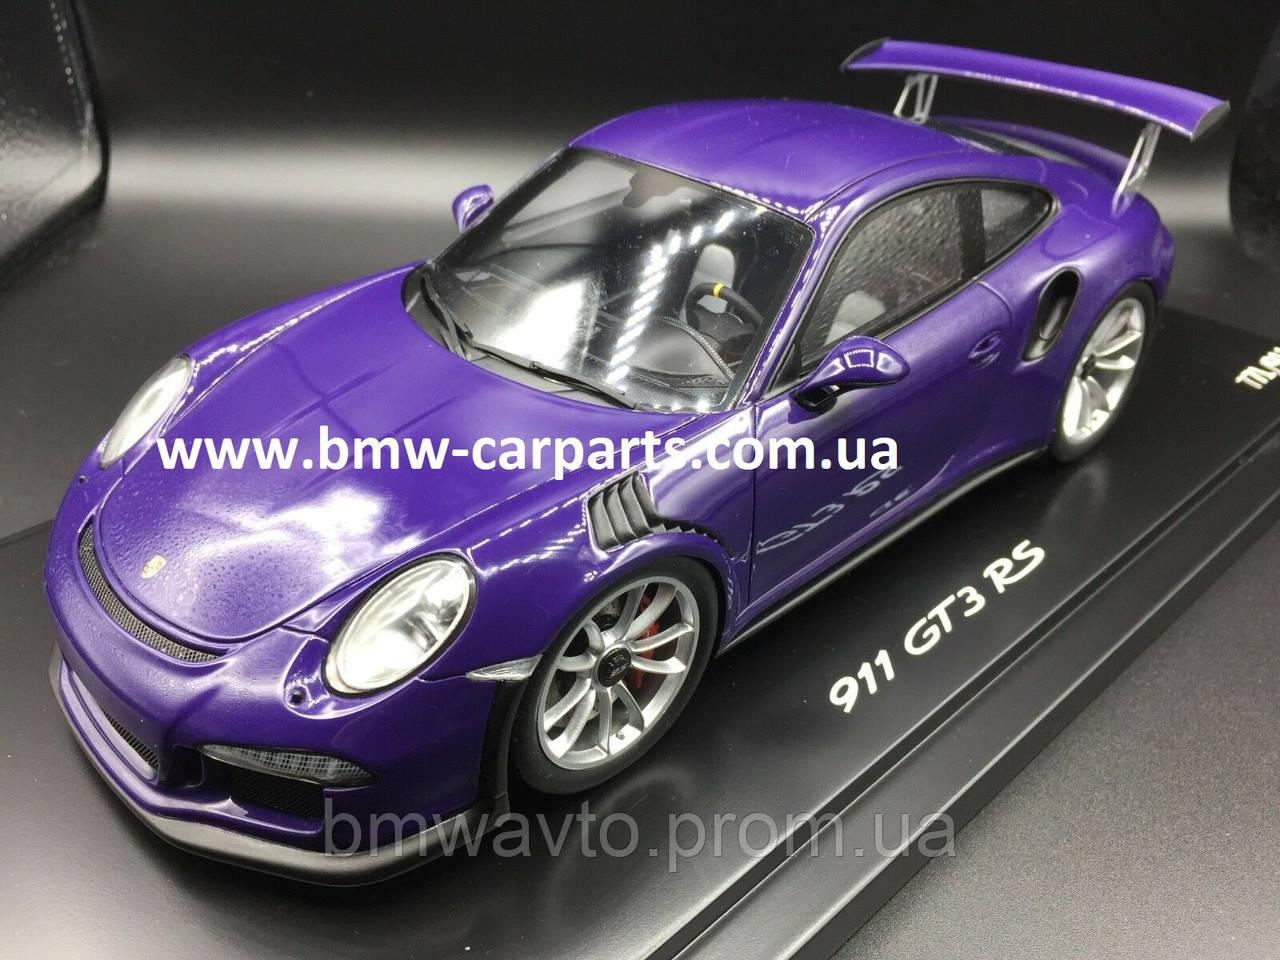 Модель автомобиля Porsche 911 GT3 RS 1:18, Purple, Limited Ed. 911 ex.